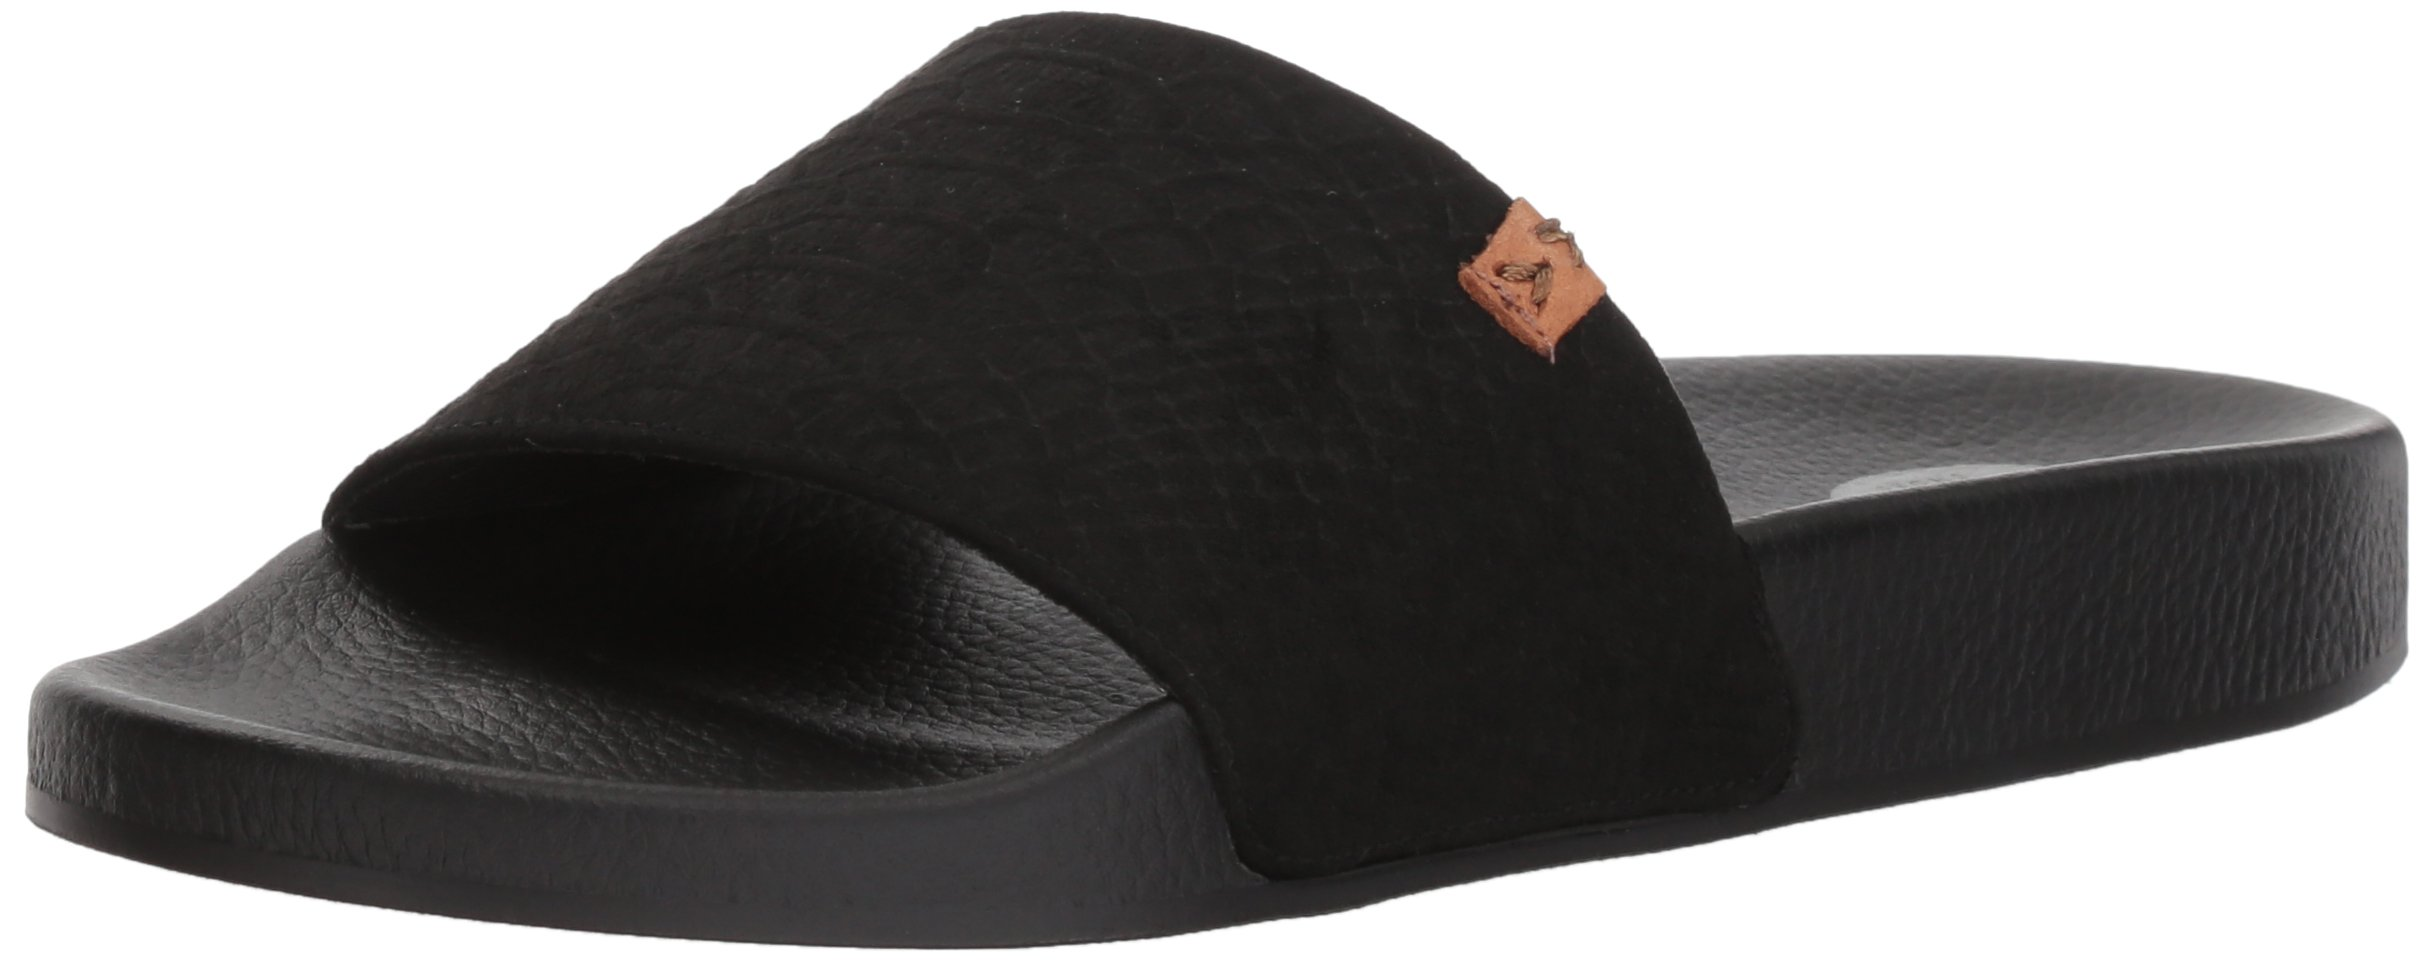 Dr. Scholl's Shoes Women's Palm Slide Sandal, Black Microfiber Snake Print, 8 M US